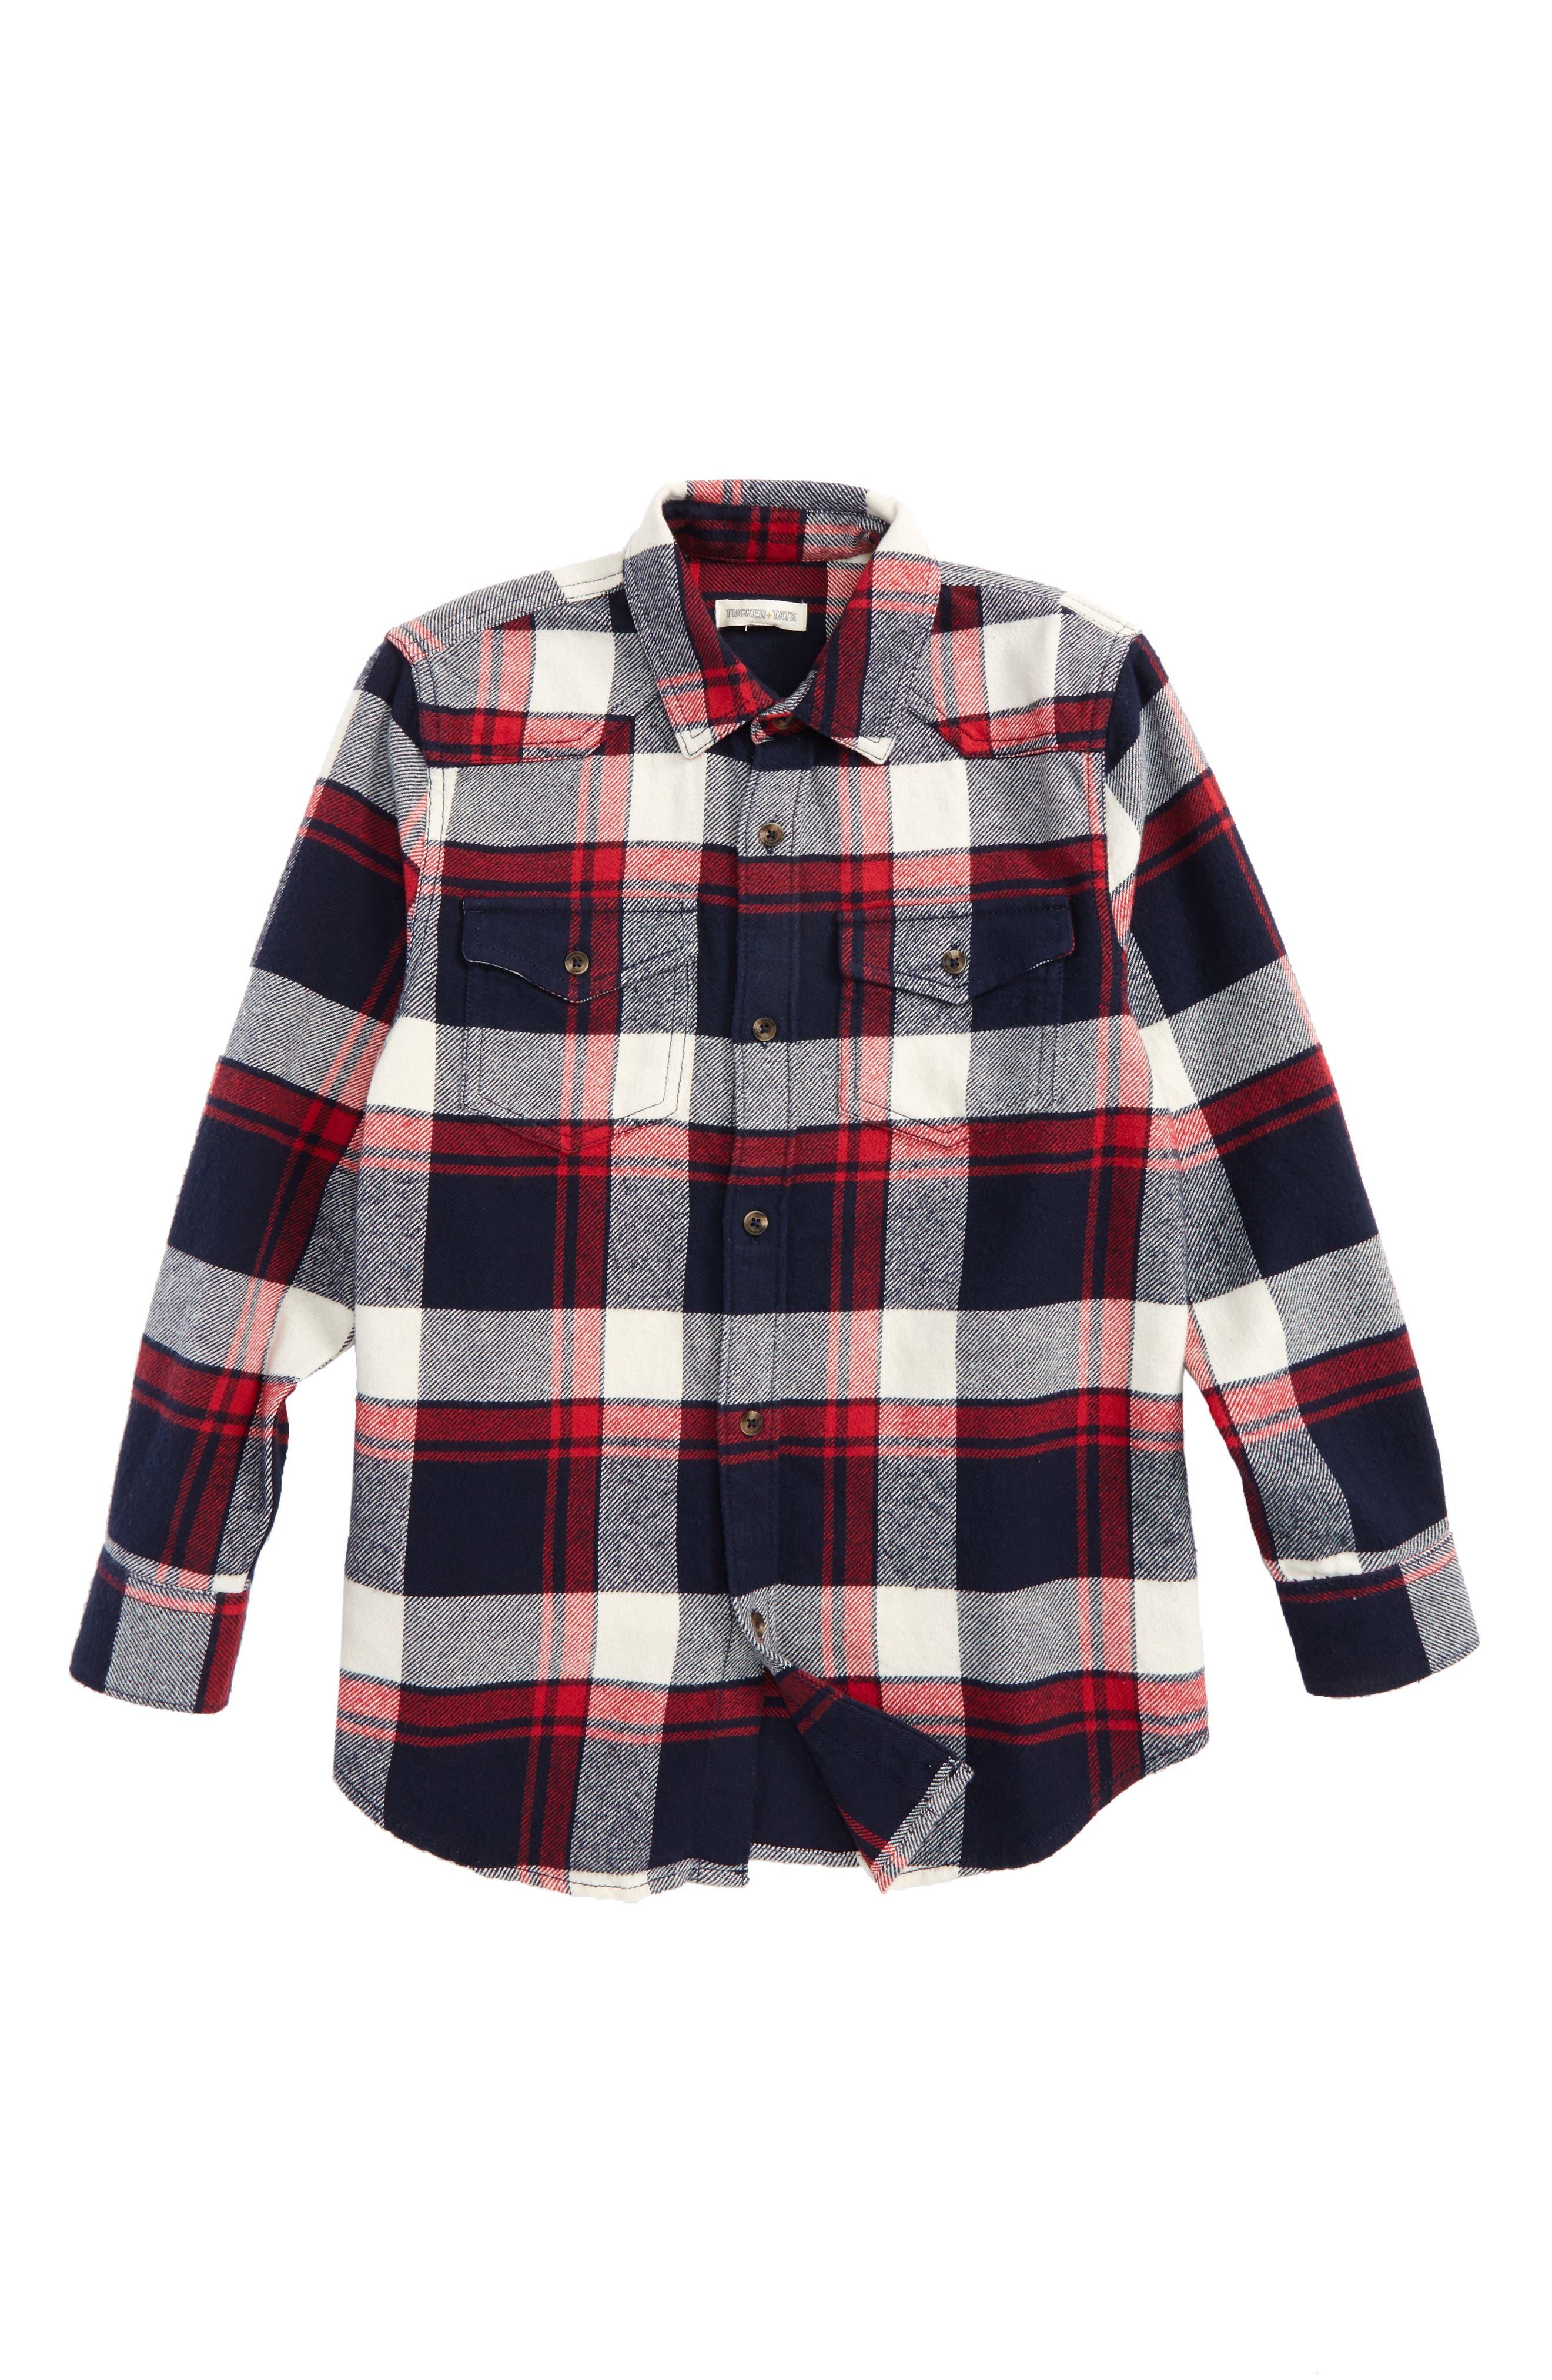 Plaid Flannel Shirt,                         Main,                         color, Red Chili- Navy Plaid